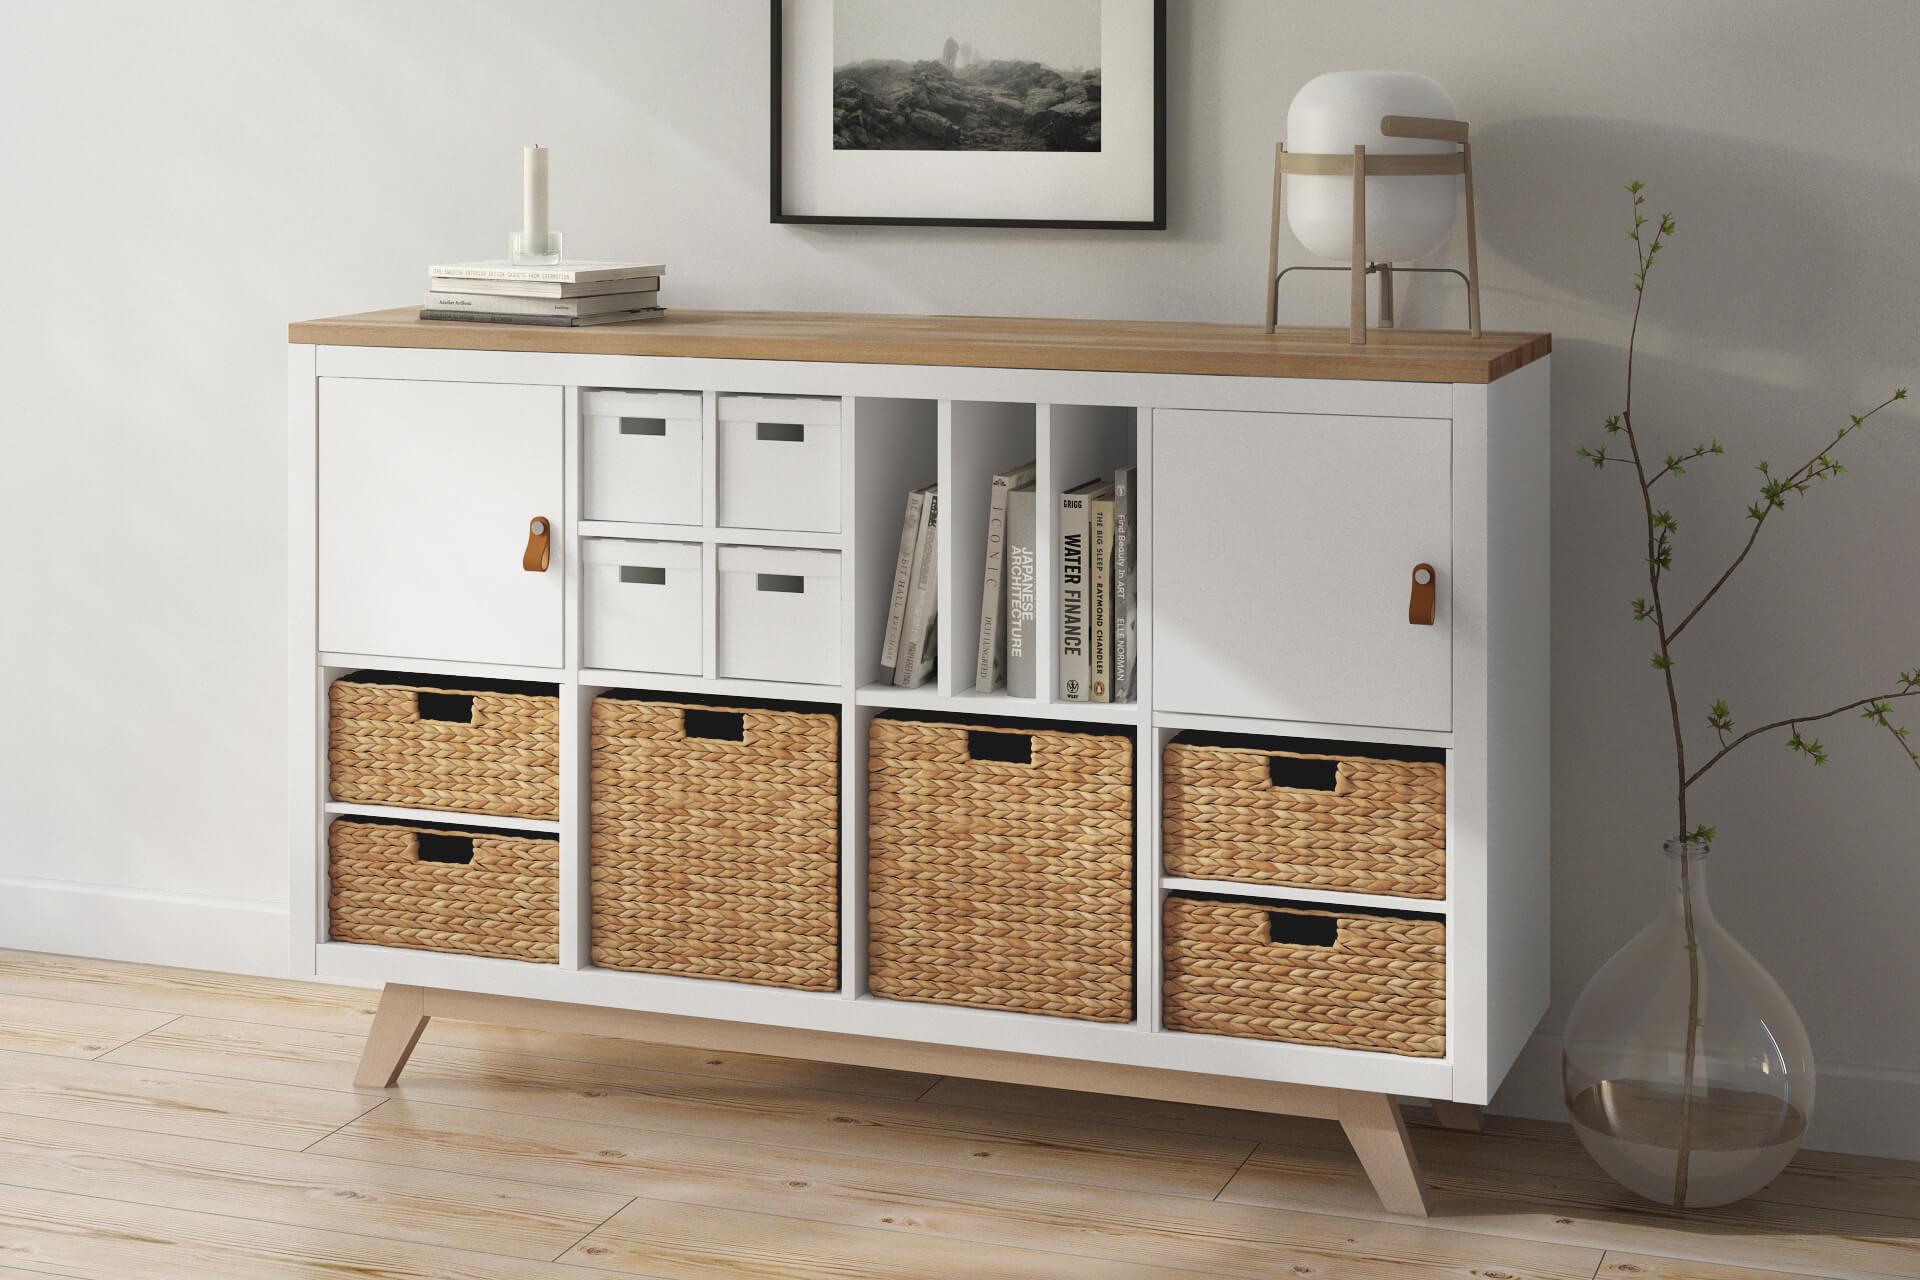 Ikea-Kallax-Regal-Zubehoer